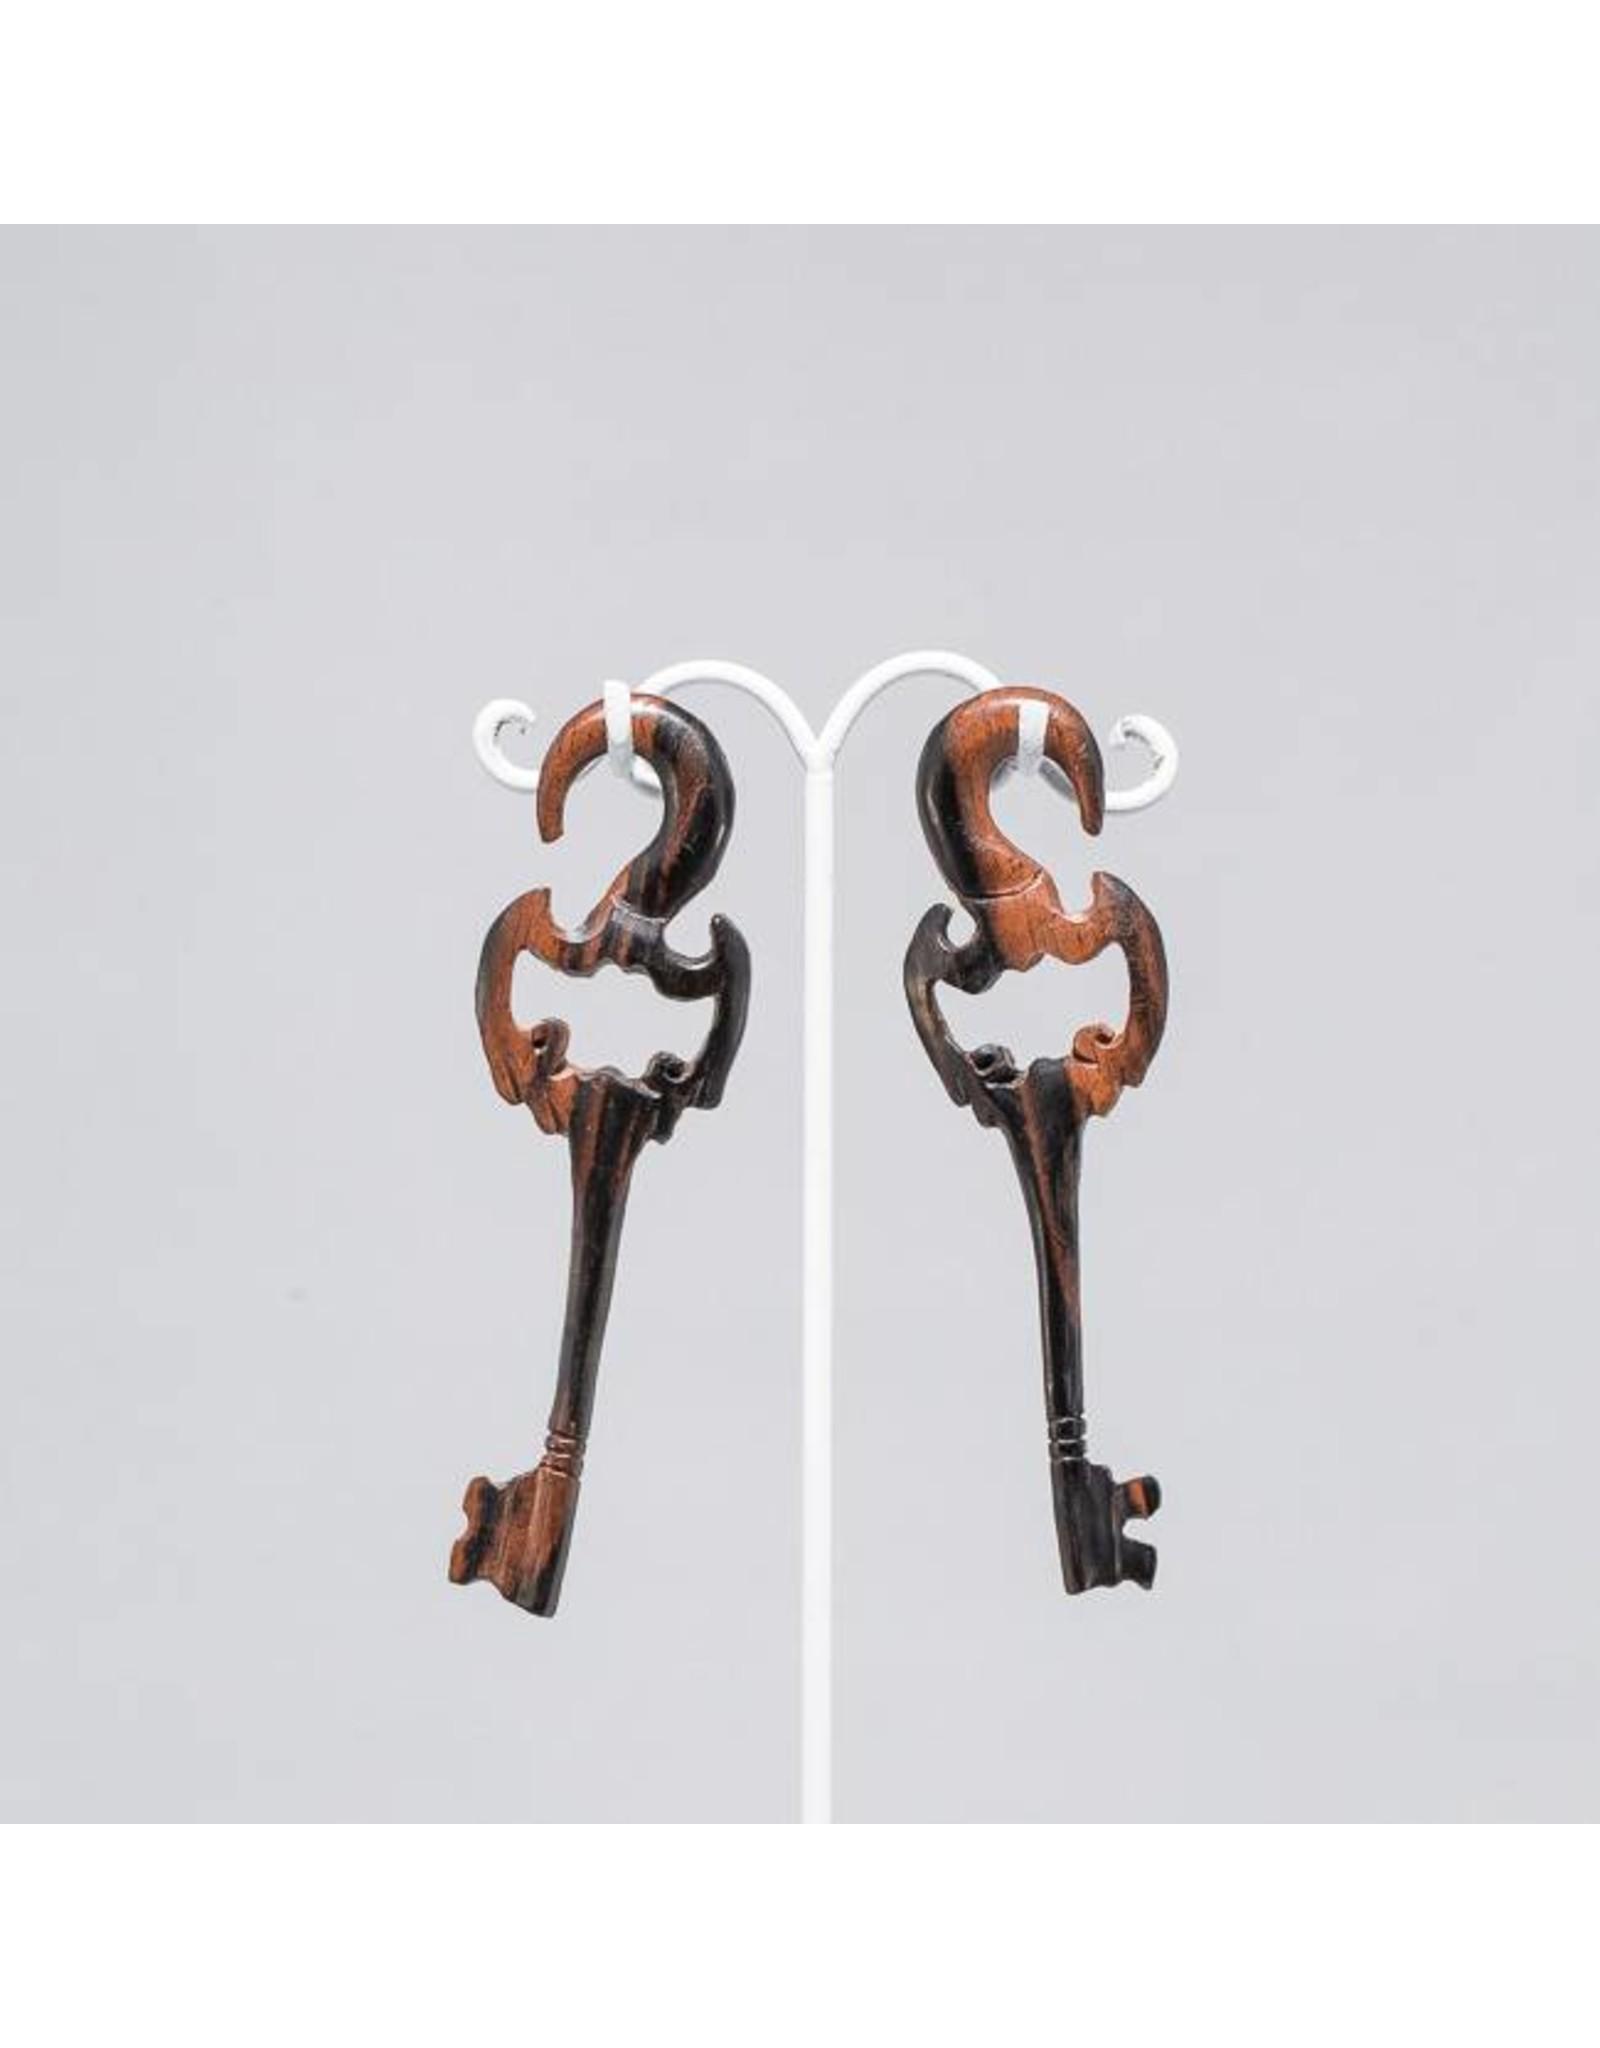 6g Ebony Key Hangers